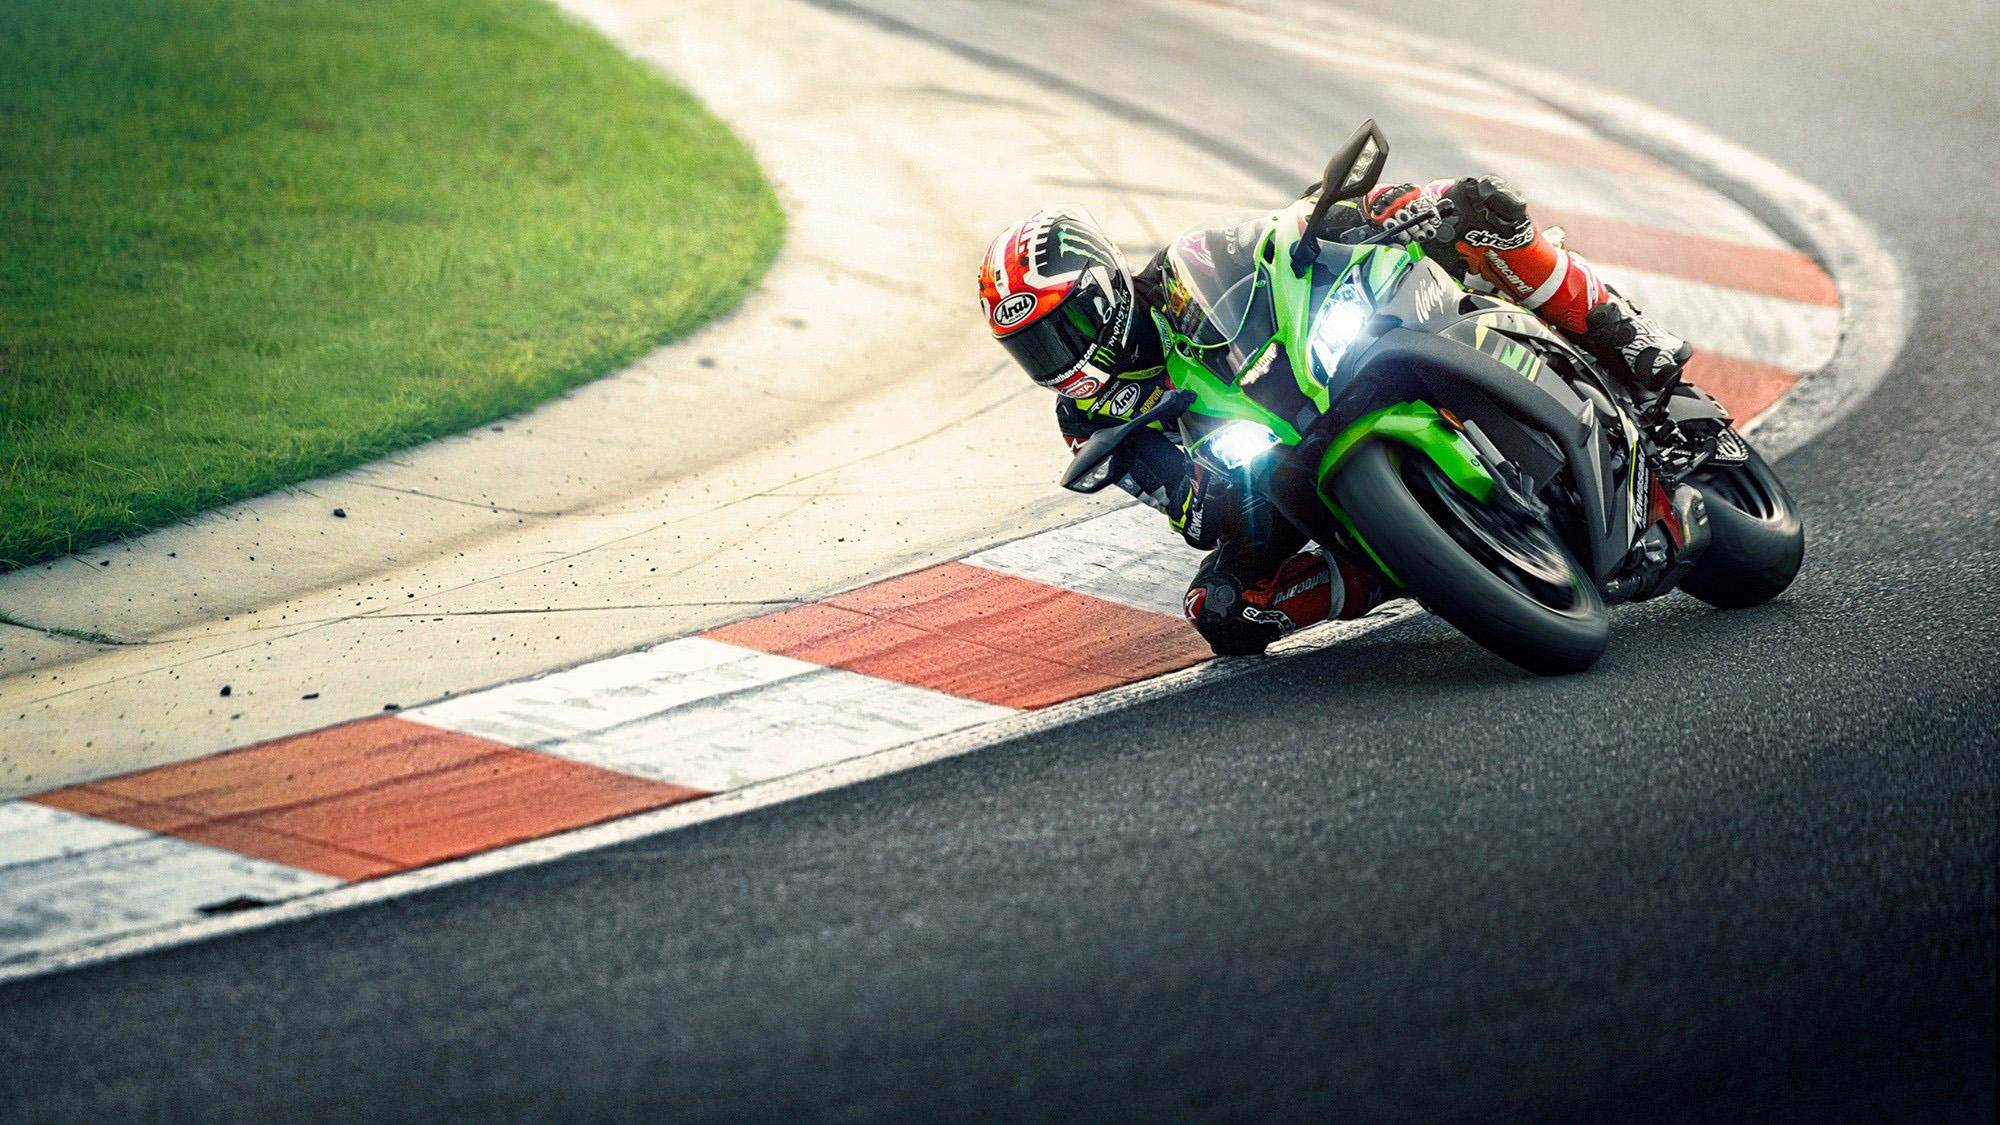 Tricampeã mundial de Superbike, Kawasaki Ninja ZX-10R 2019 ficou ainda mais potente